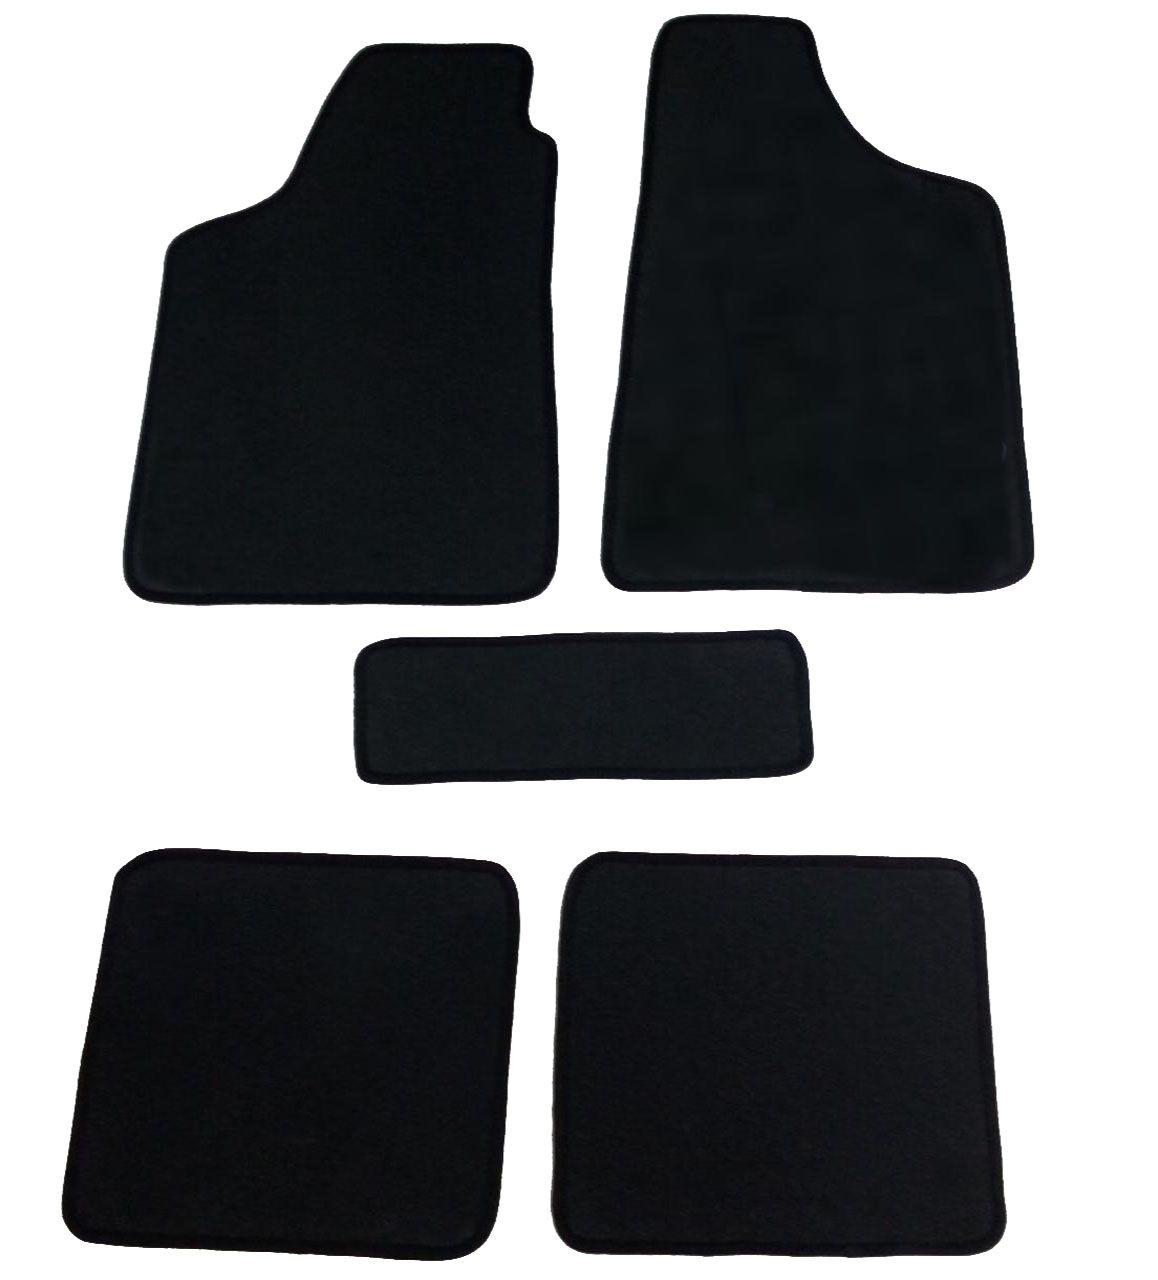 Tapete Fiat 500 Carpete Exclusiv Base Pinada